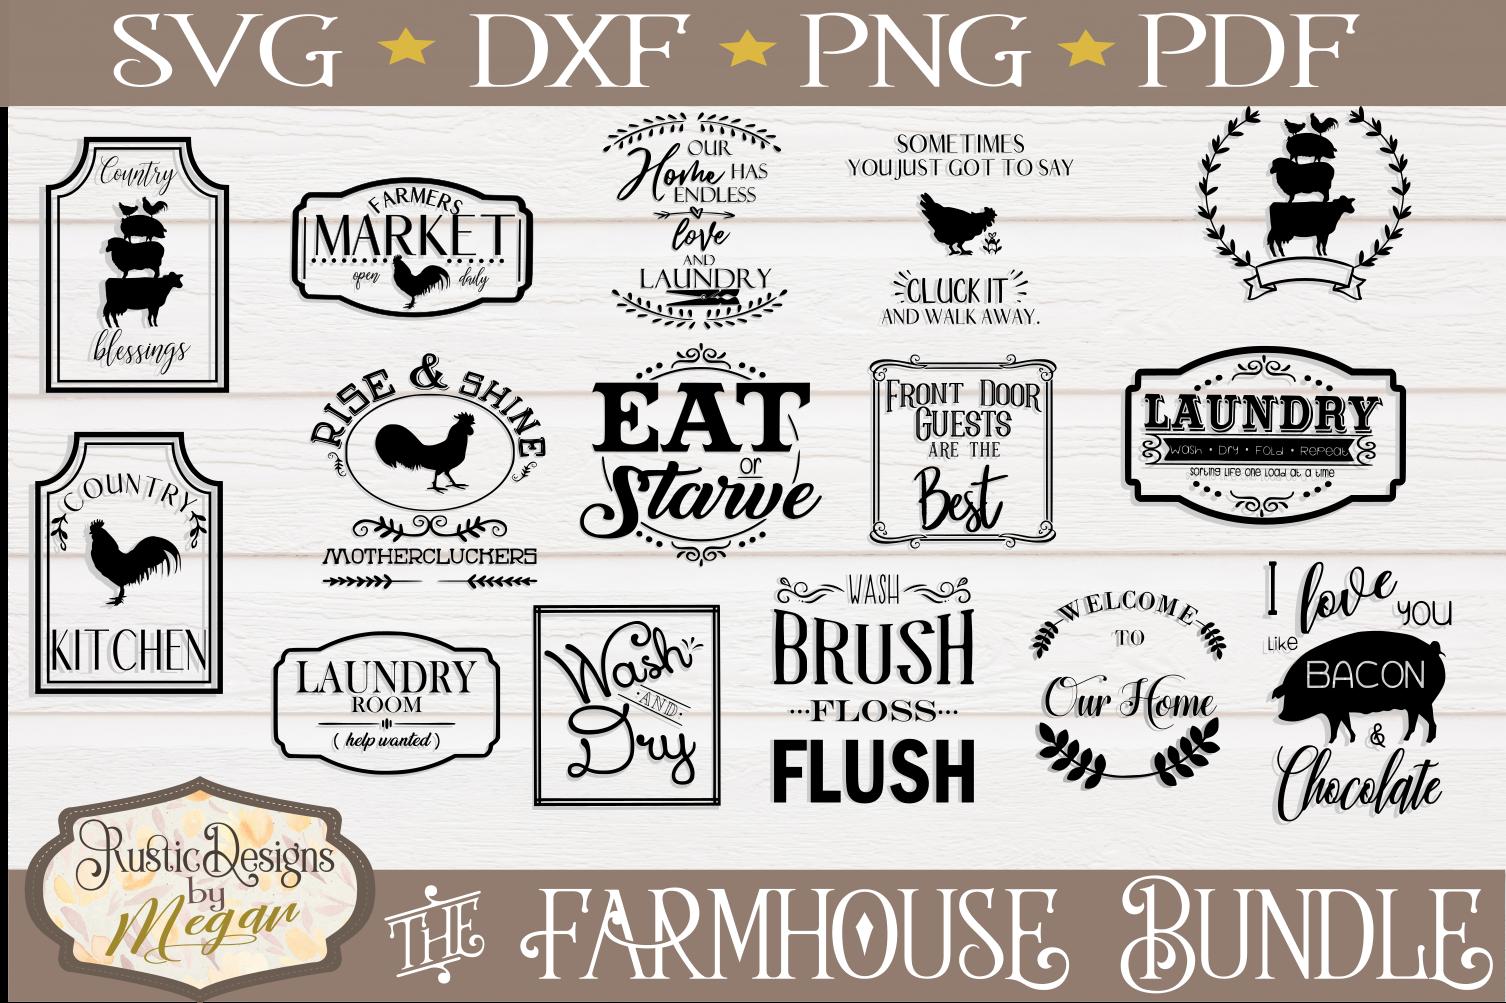 Farmhouse SVG bundle - farmhouse cut files example image 1